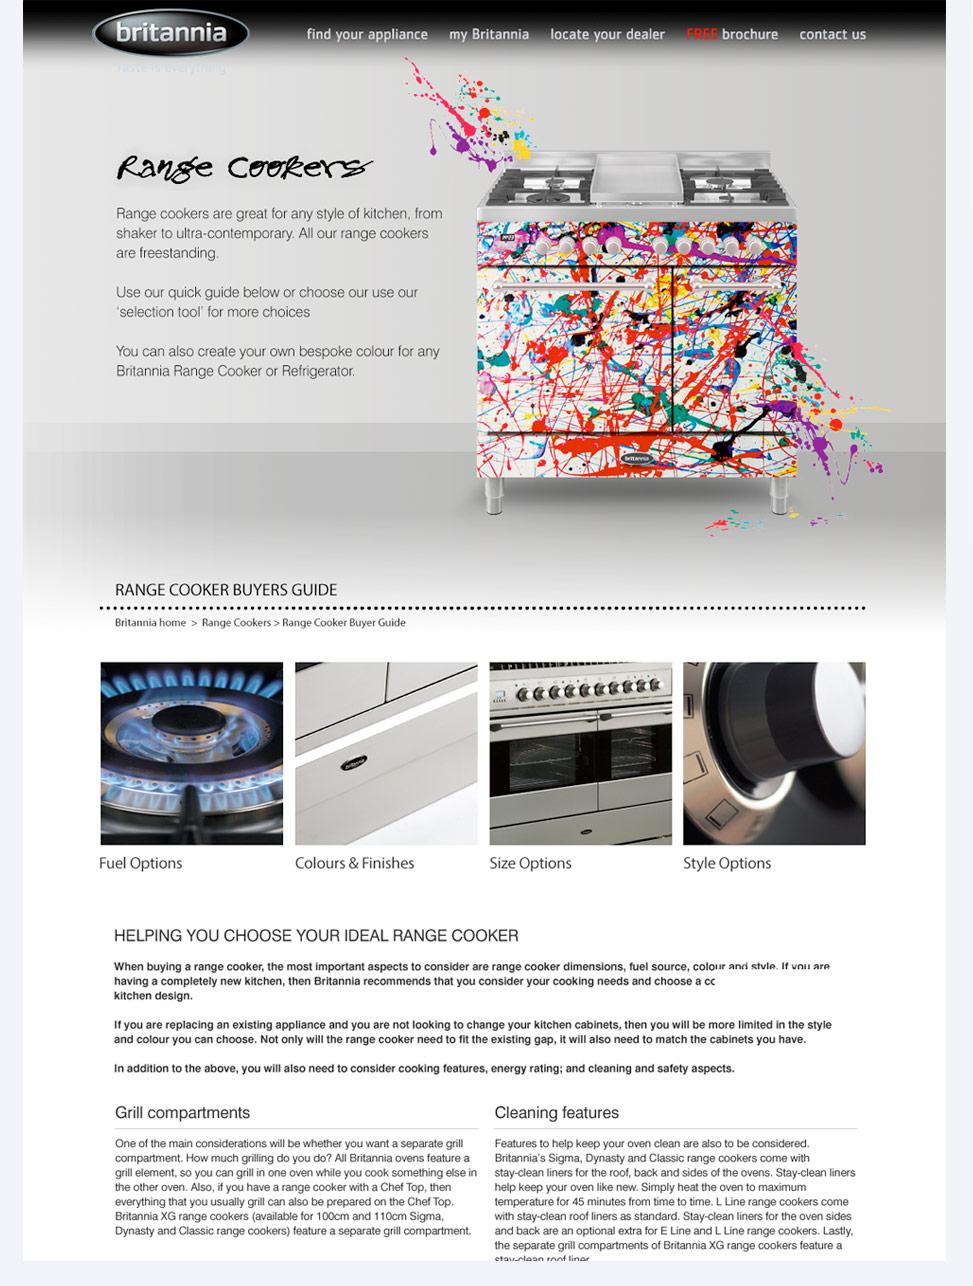 website design, increase website conversion rate